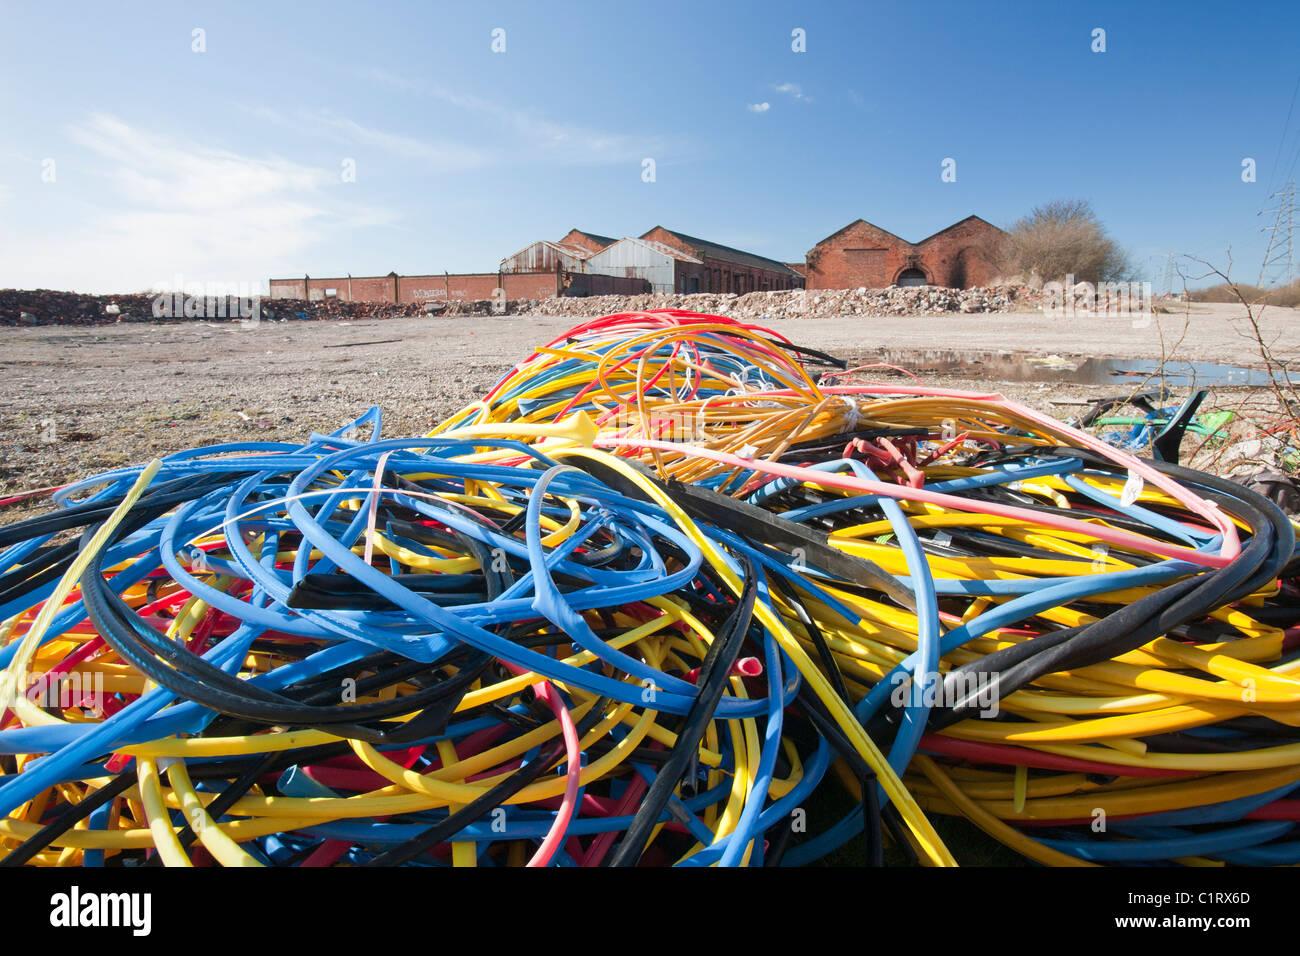 Plastic Coating Stockfotos & Plastic Coating Bilder - Alamy